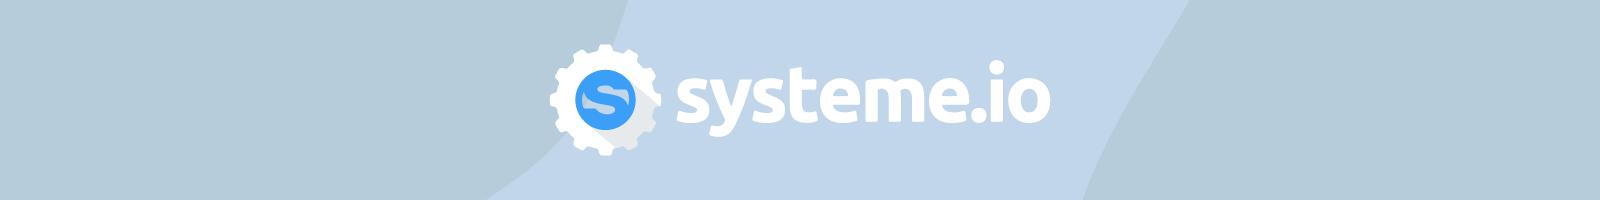 System.io Logo